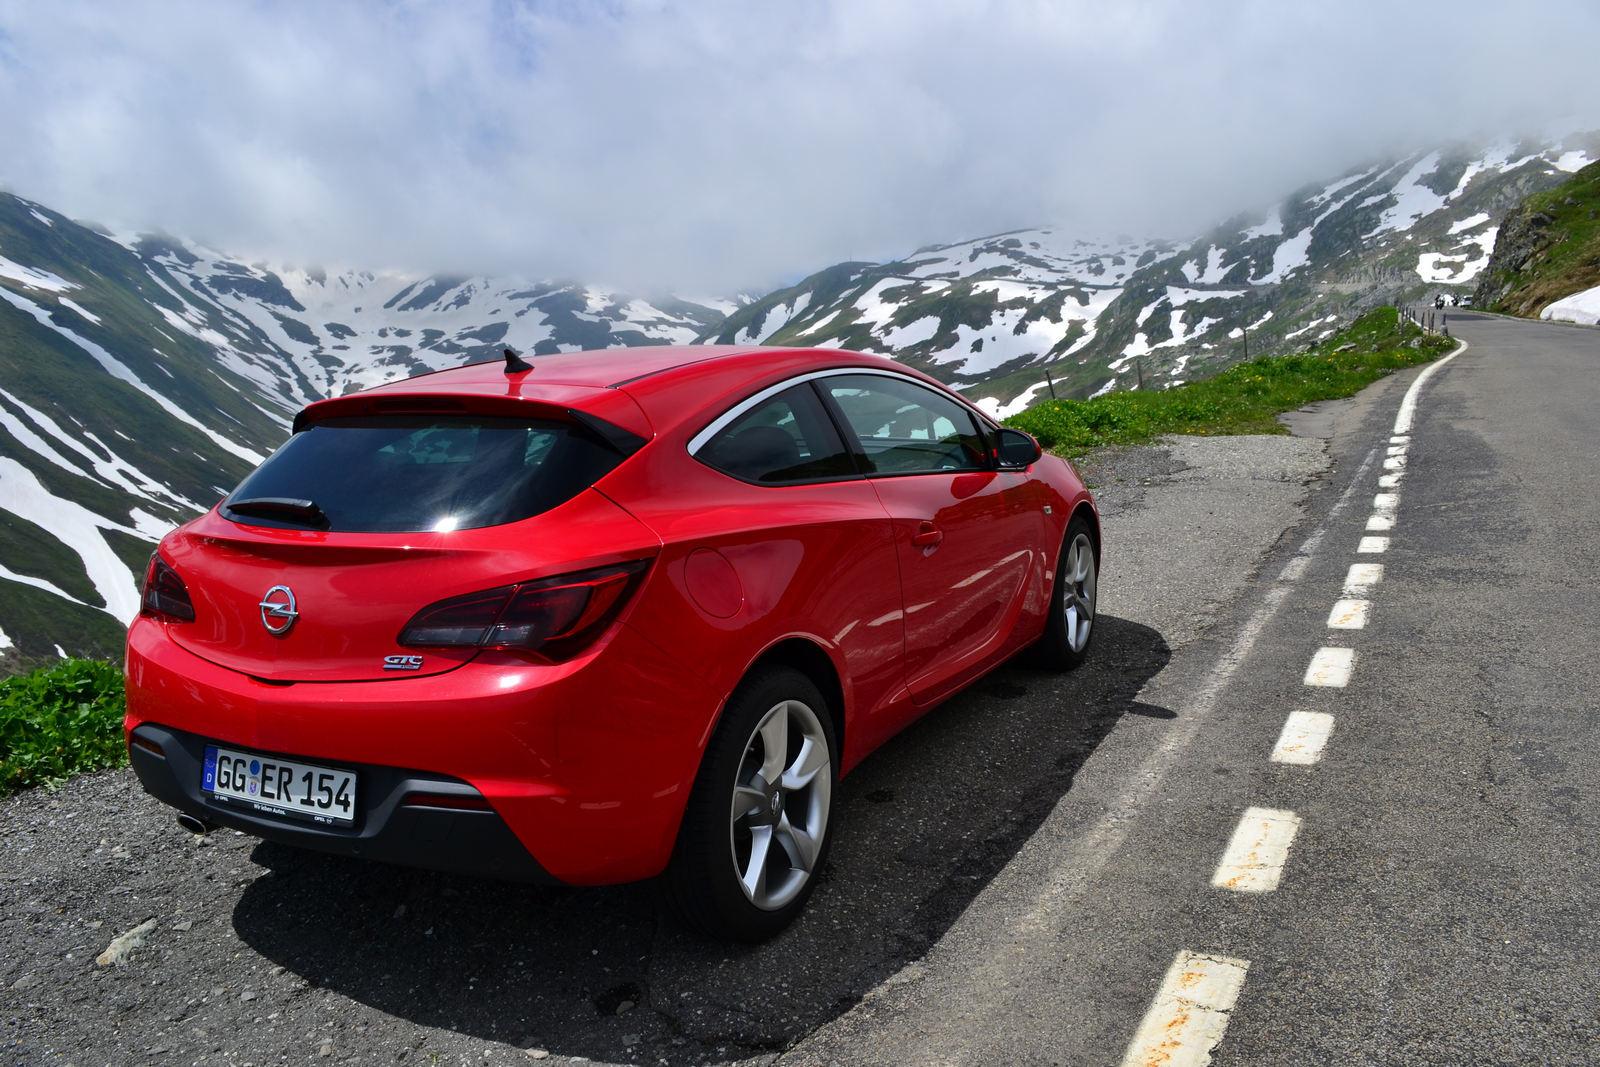 Opel GTC Astra in Alpi